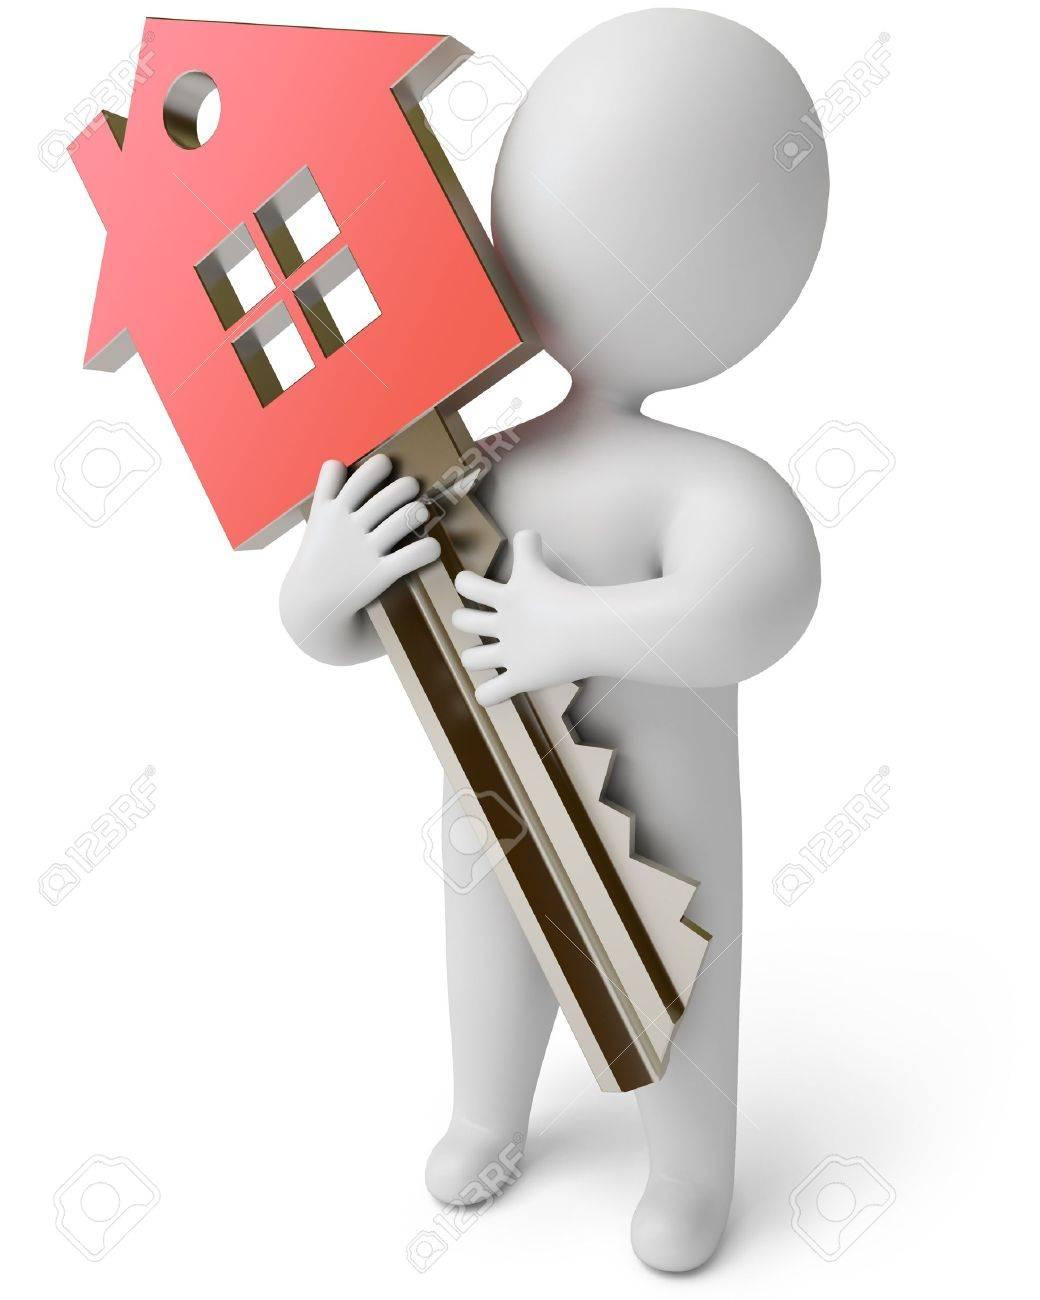 house key. house key on a white background 3d render stock photo 13923759